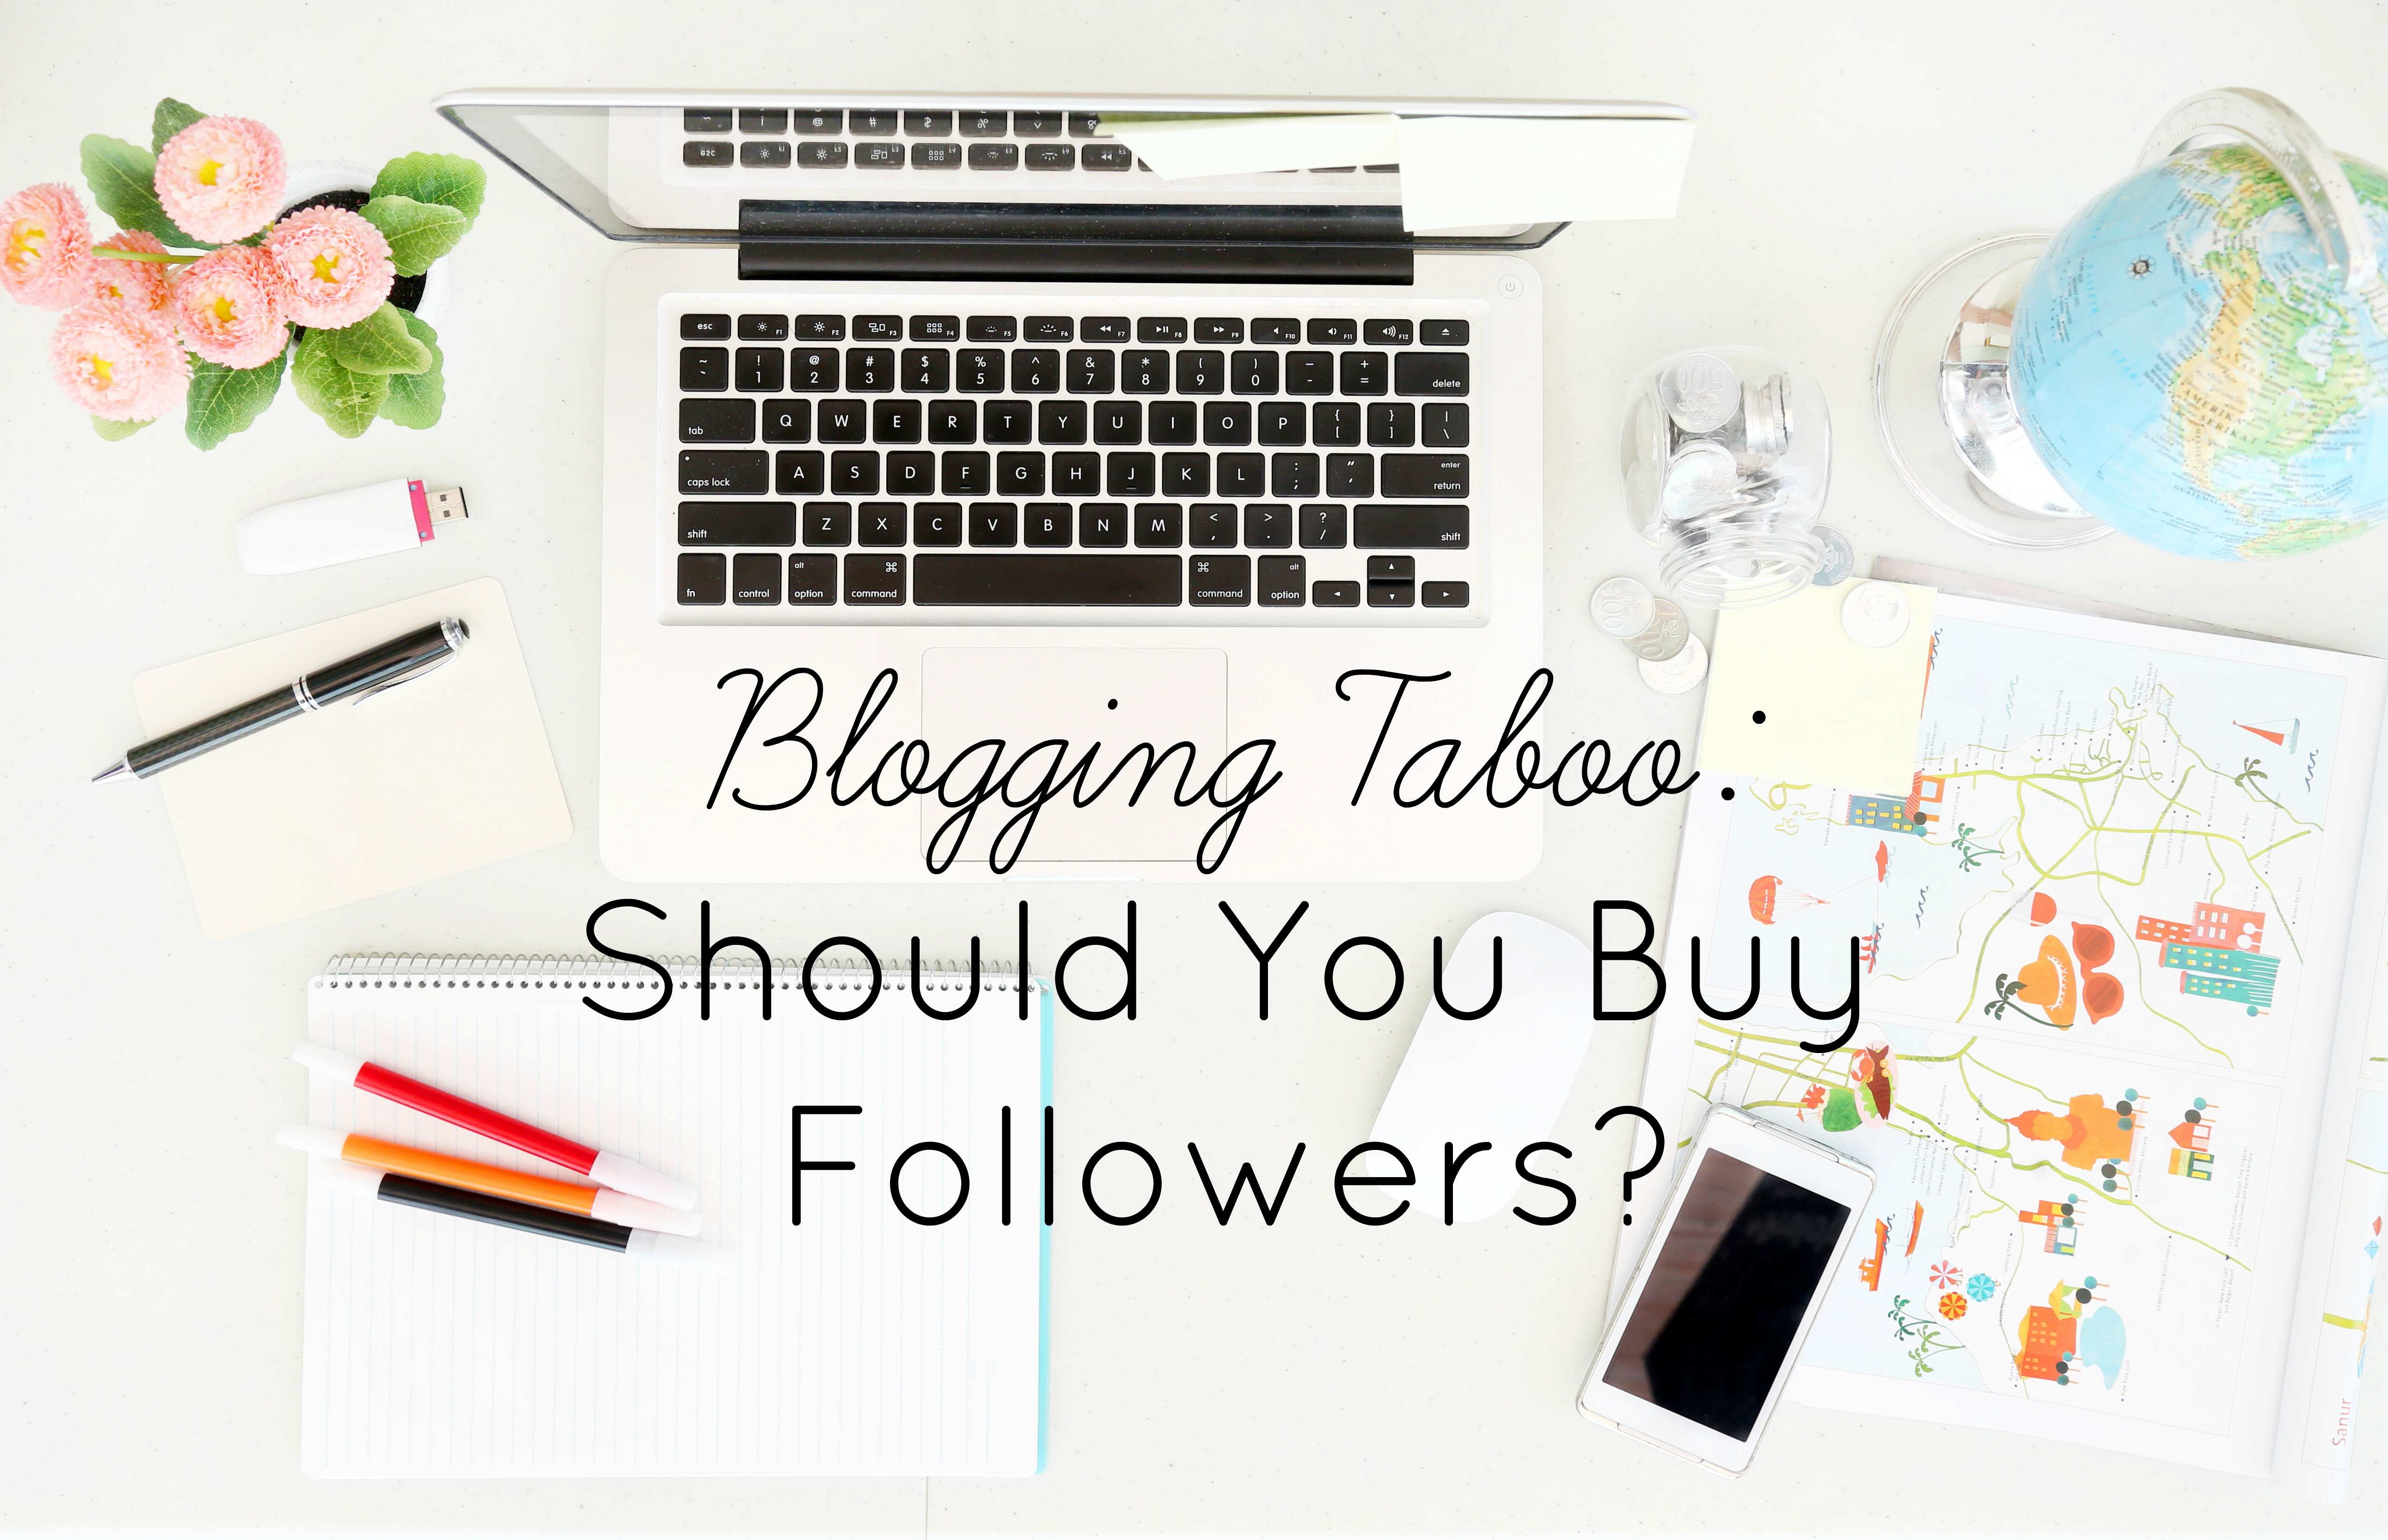 buy-followers-blog-tips